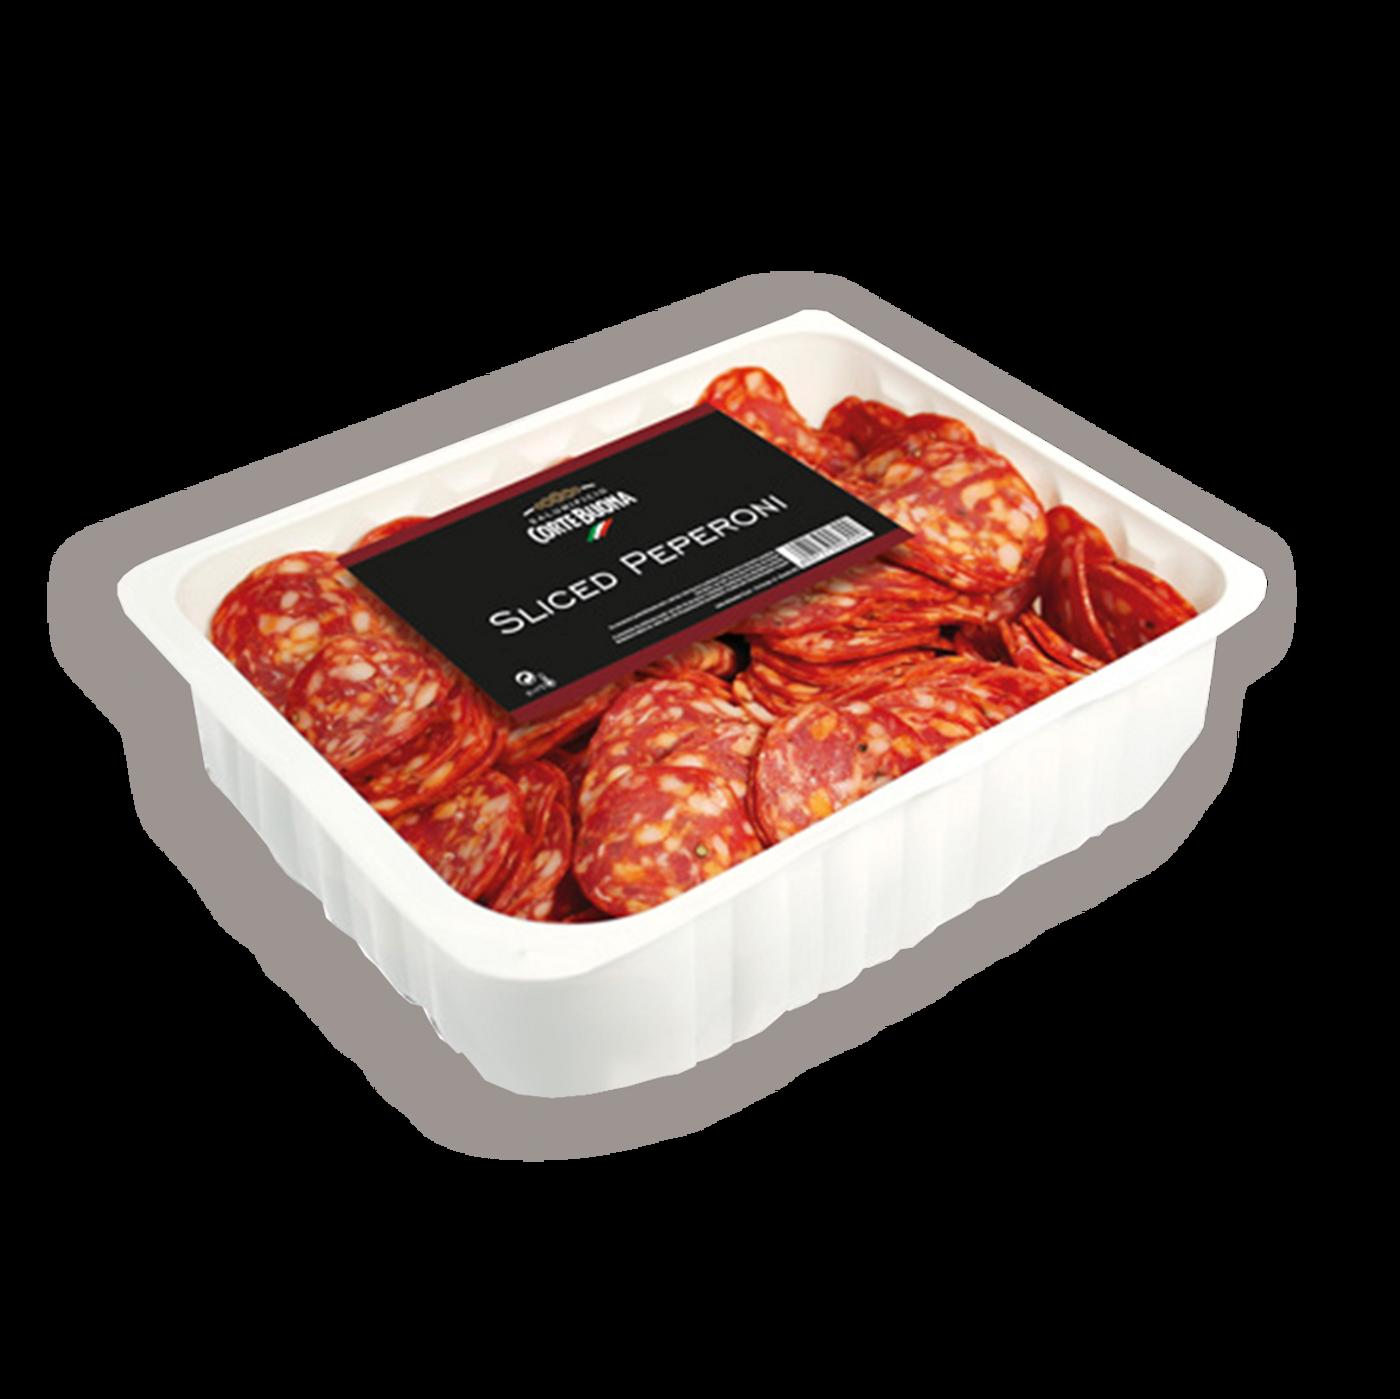 Salciccia pepperone precortada